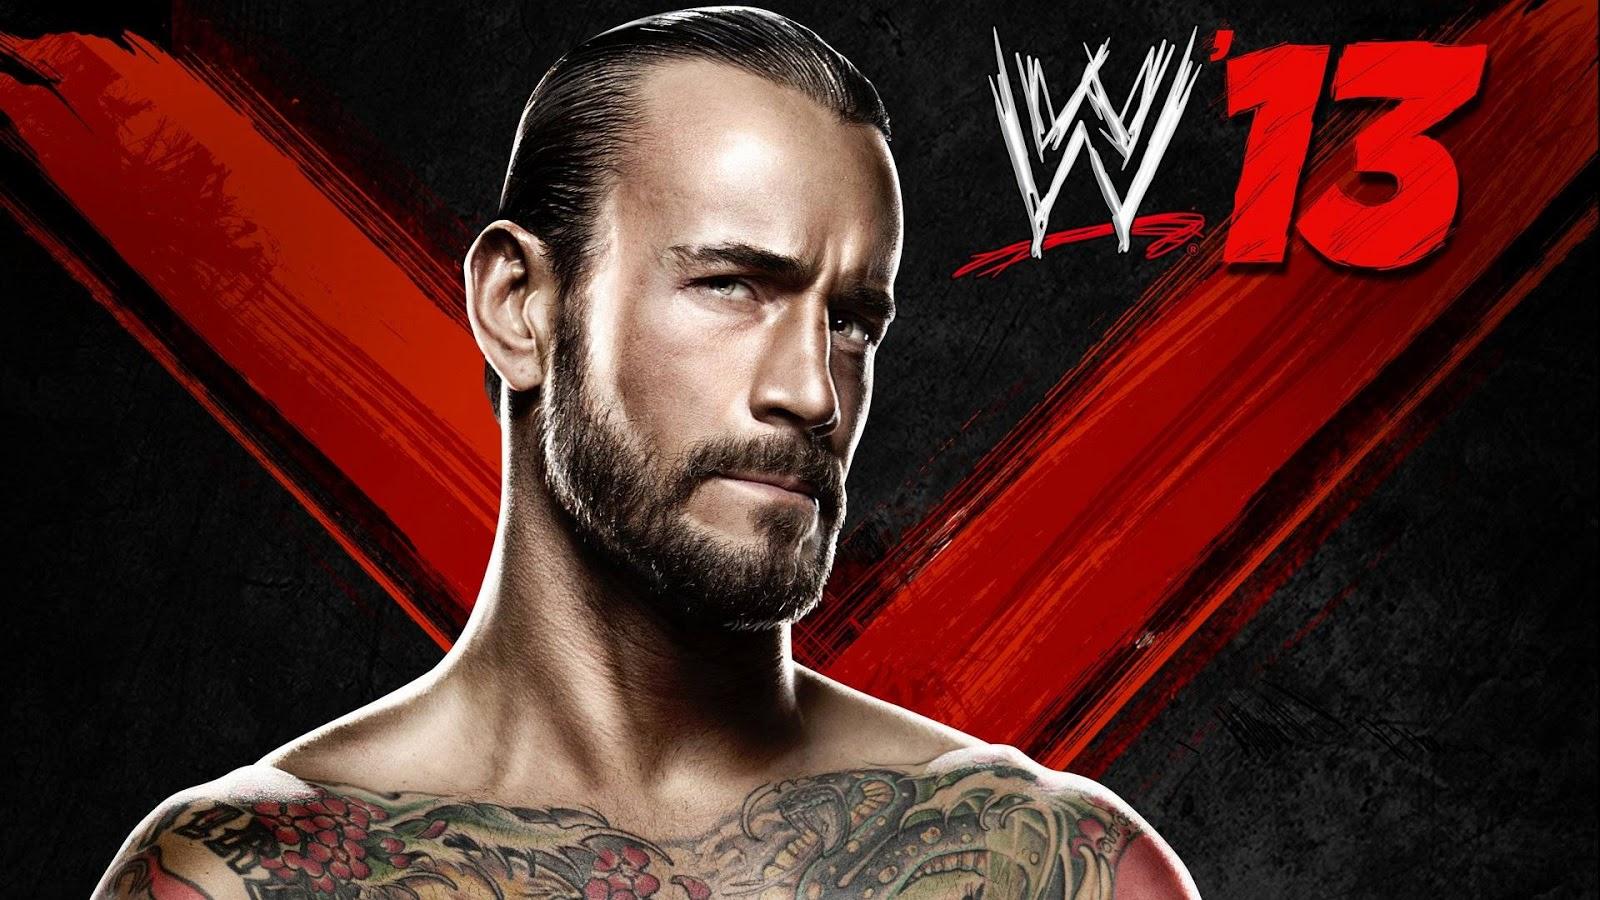 Download WWE 13 Pc Game Full Pc Version